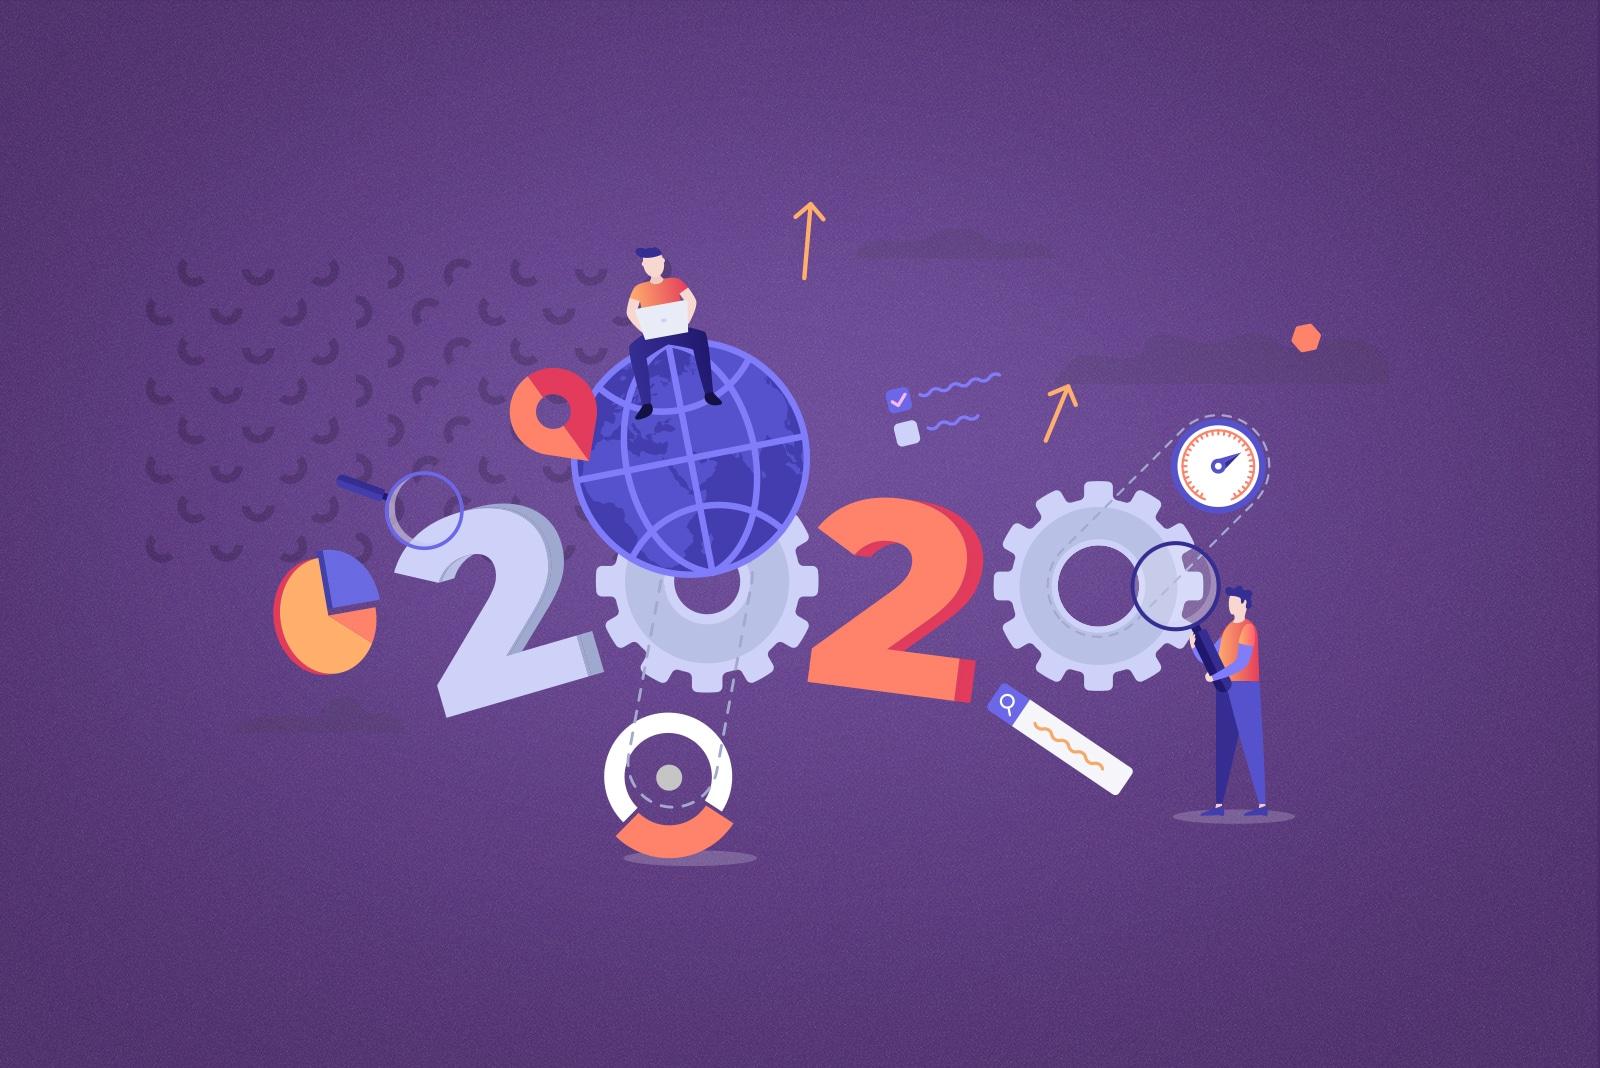 ilustracao-o-avanco-do-marketing-digital-2020